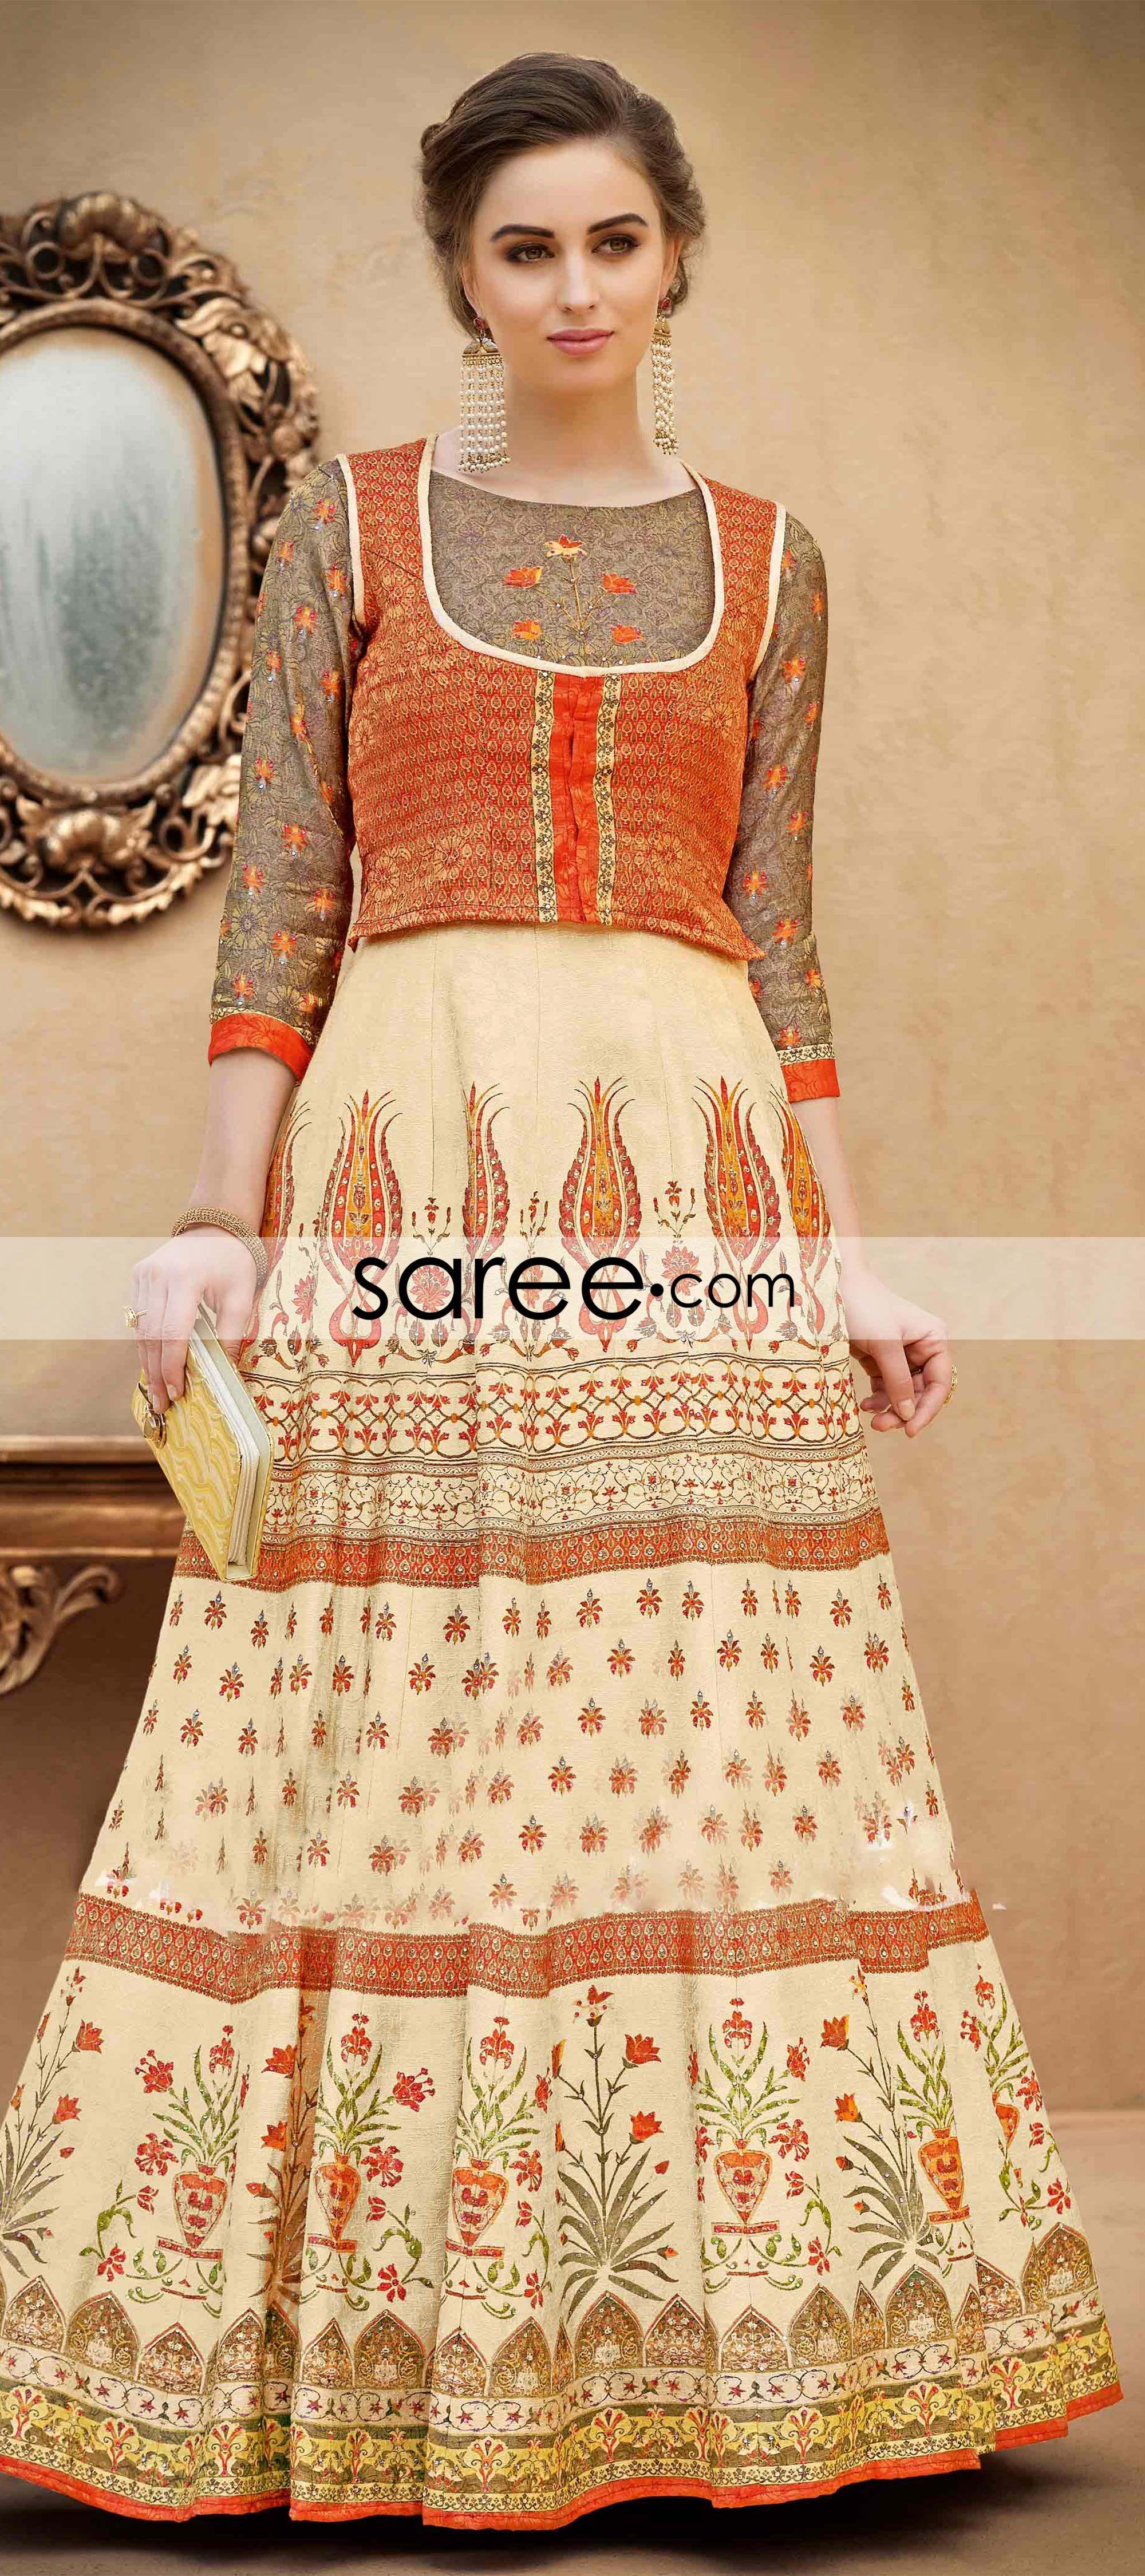 6c3d5287729ac Brown and Cream Banarasi Art Silk Gown With Digital Print